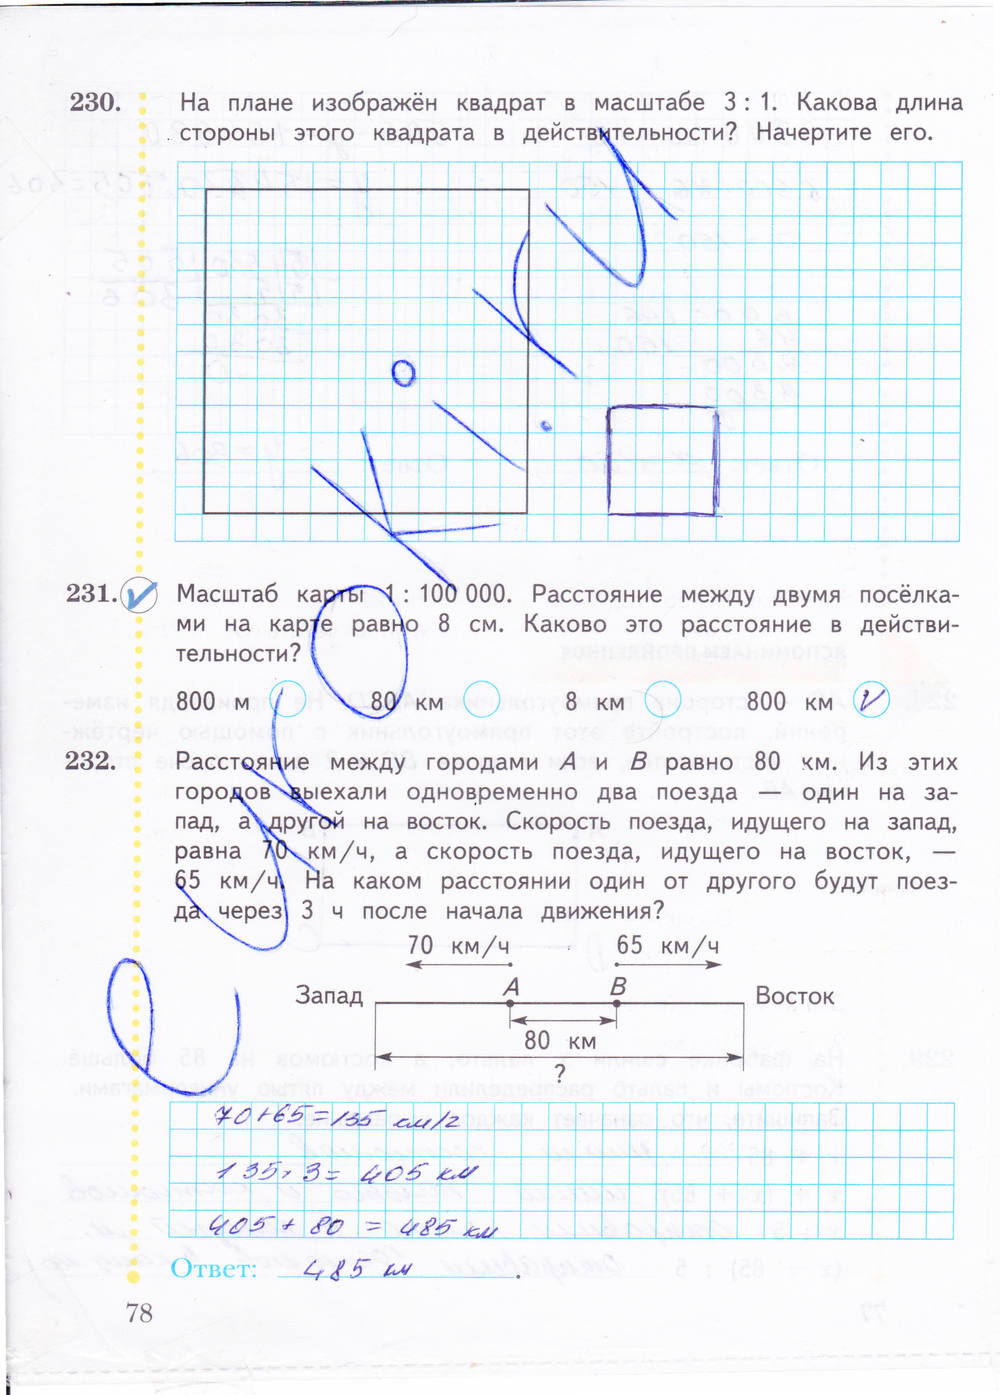 Граф 4 вентана решебник математика класс в.н.рудницкая